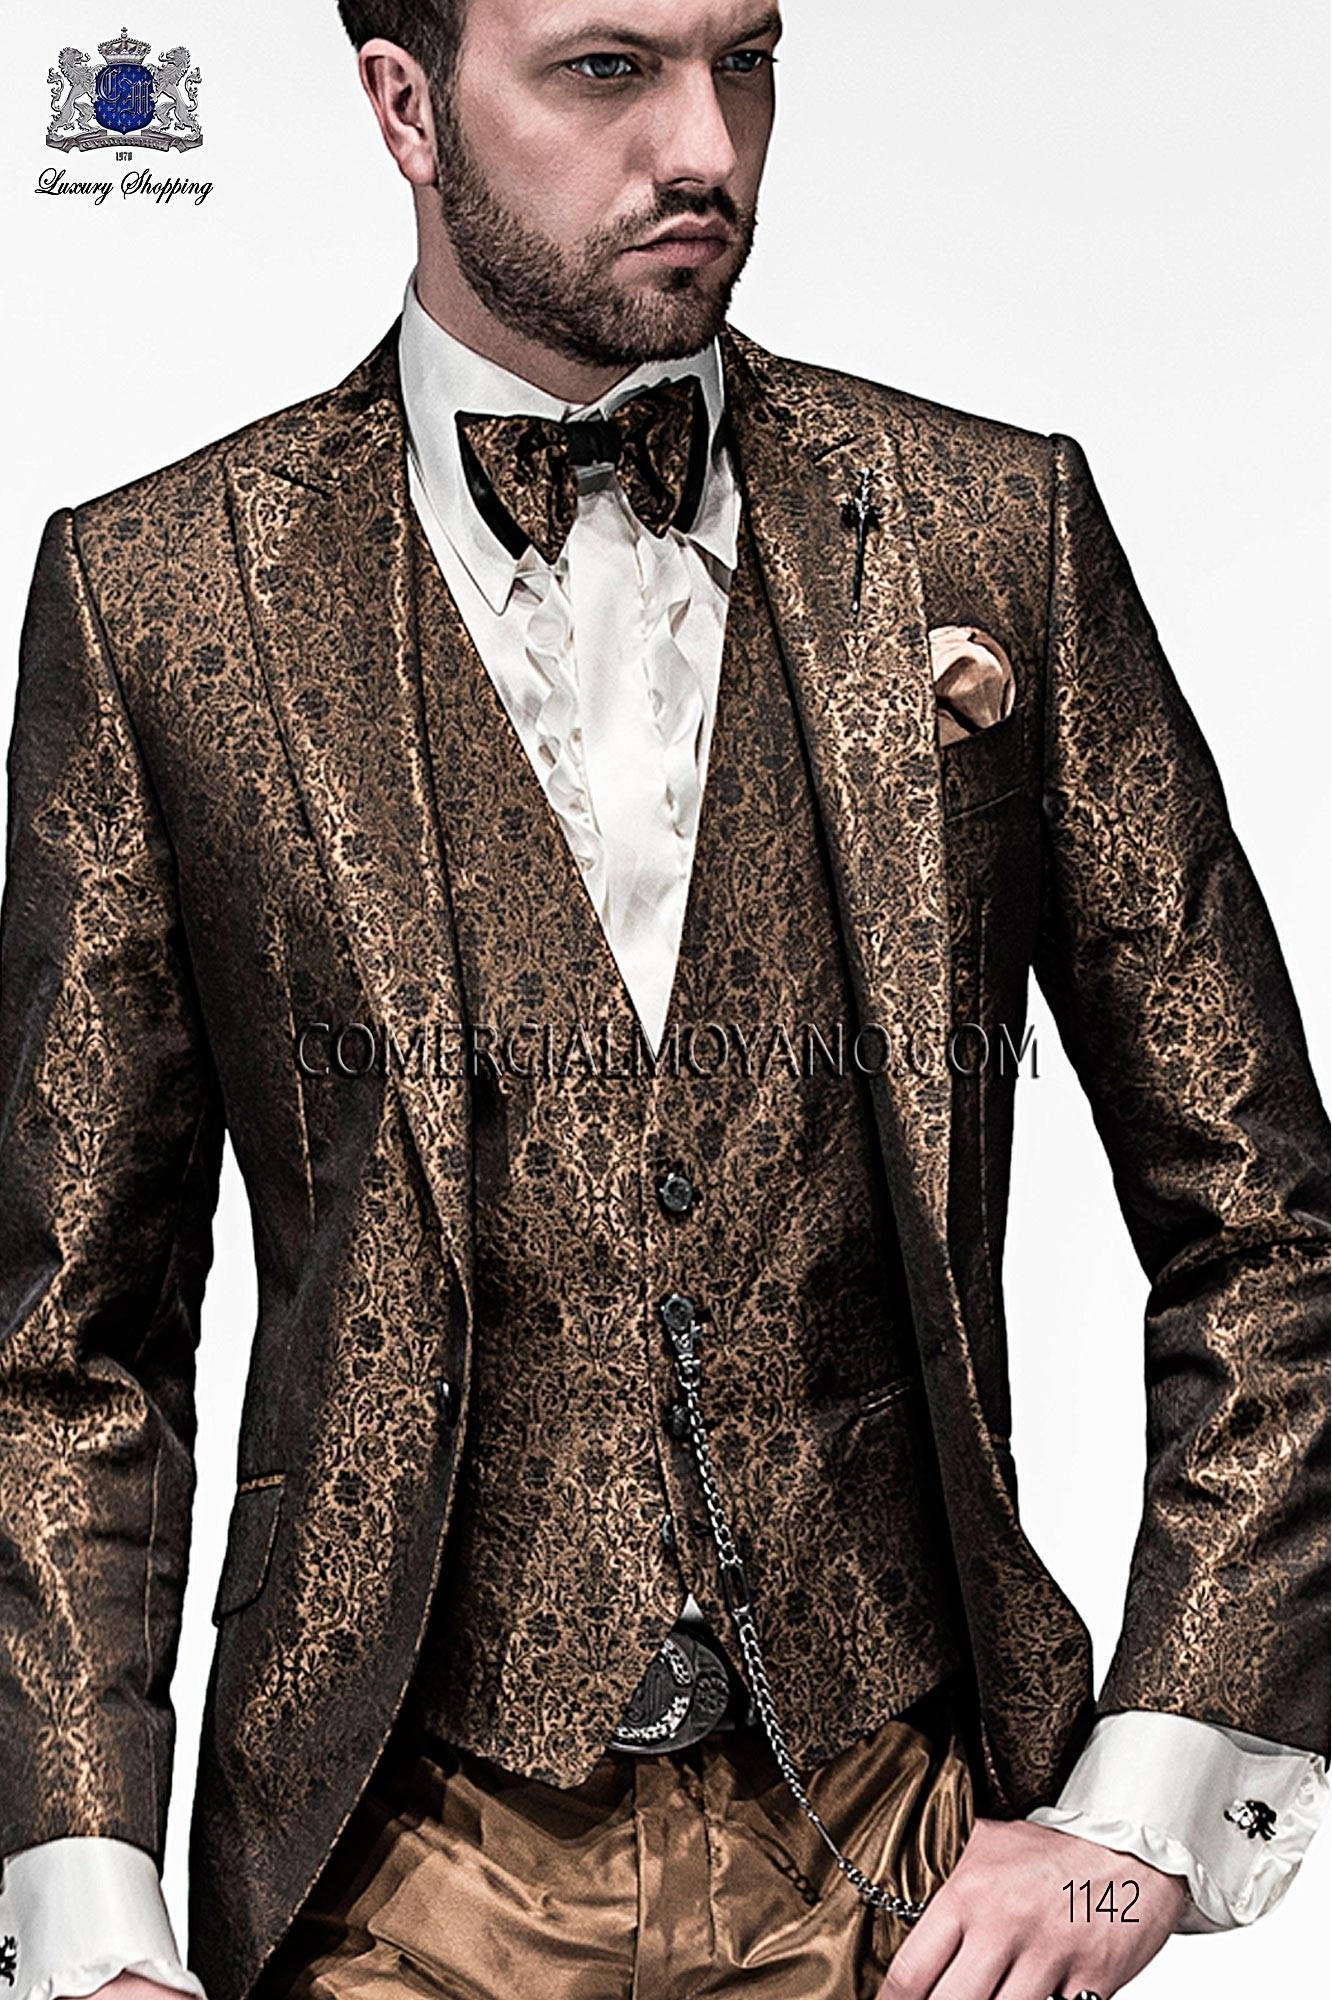 Italian emotion black and gold men wedding suit, model: 1142 Ottavio Nuccio Gala Emotion Collection